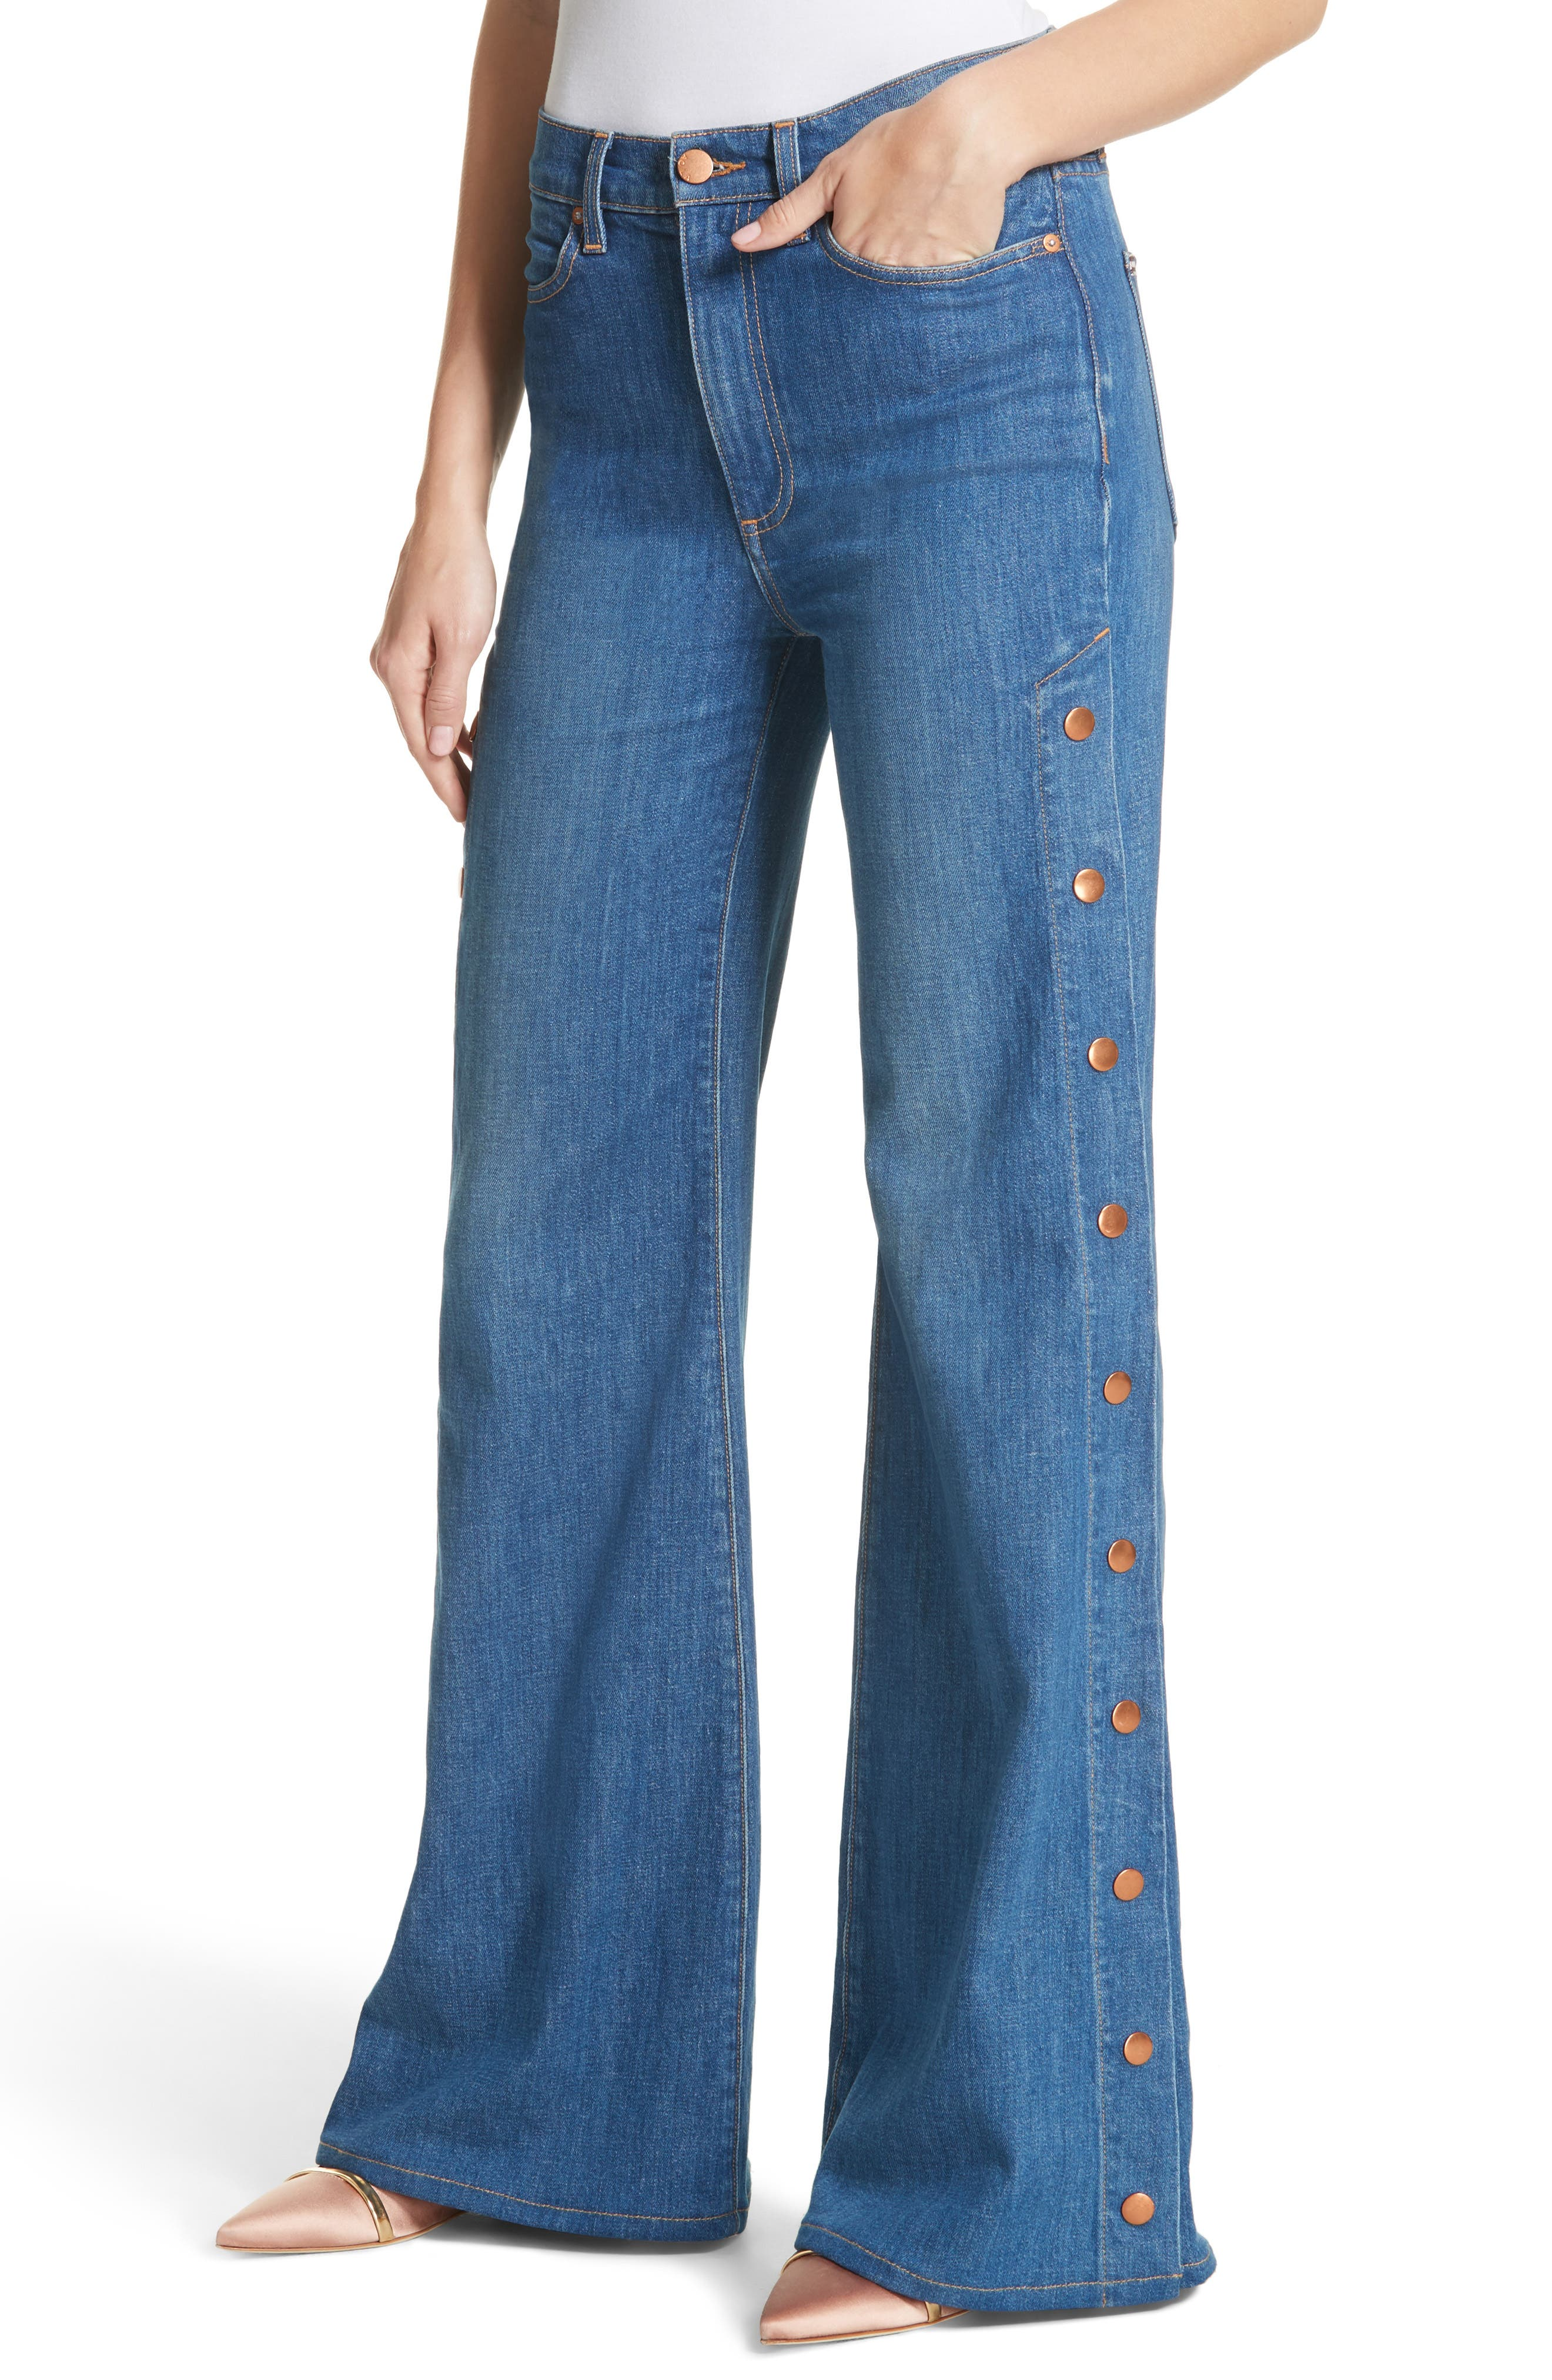 AO.LA Gorgeous Snap Side Flare Leg Jeans,                             Alternate thumbnail 4, color,                             French Blue